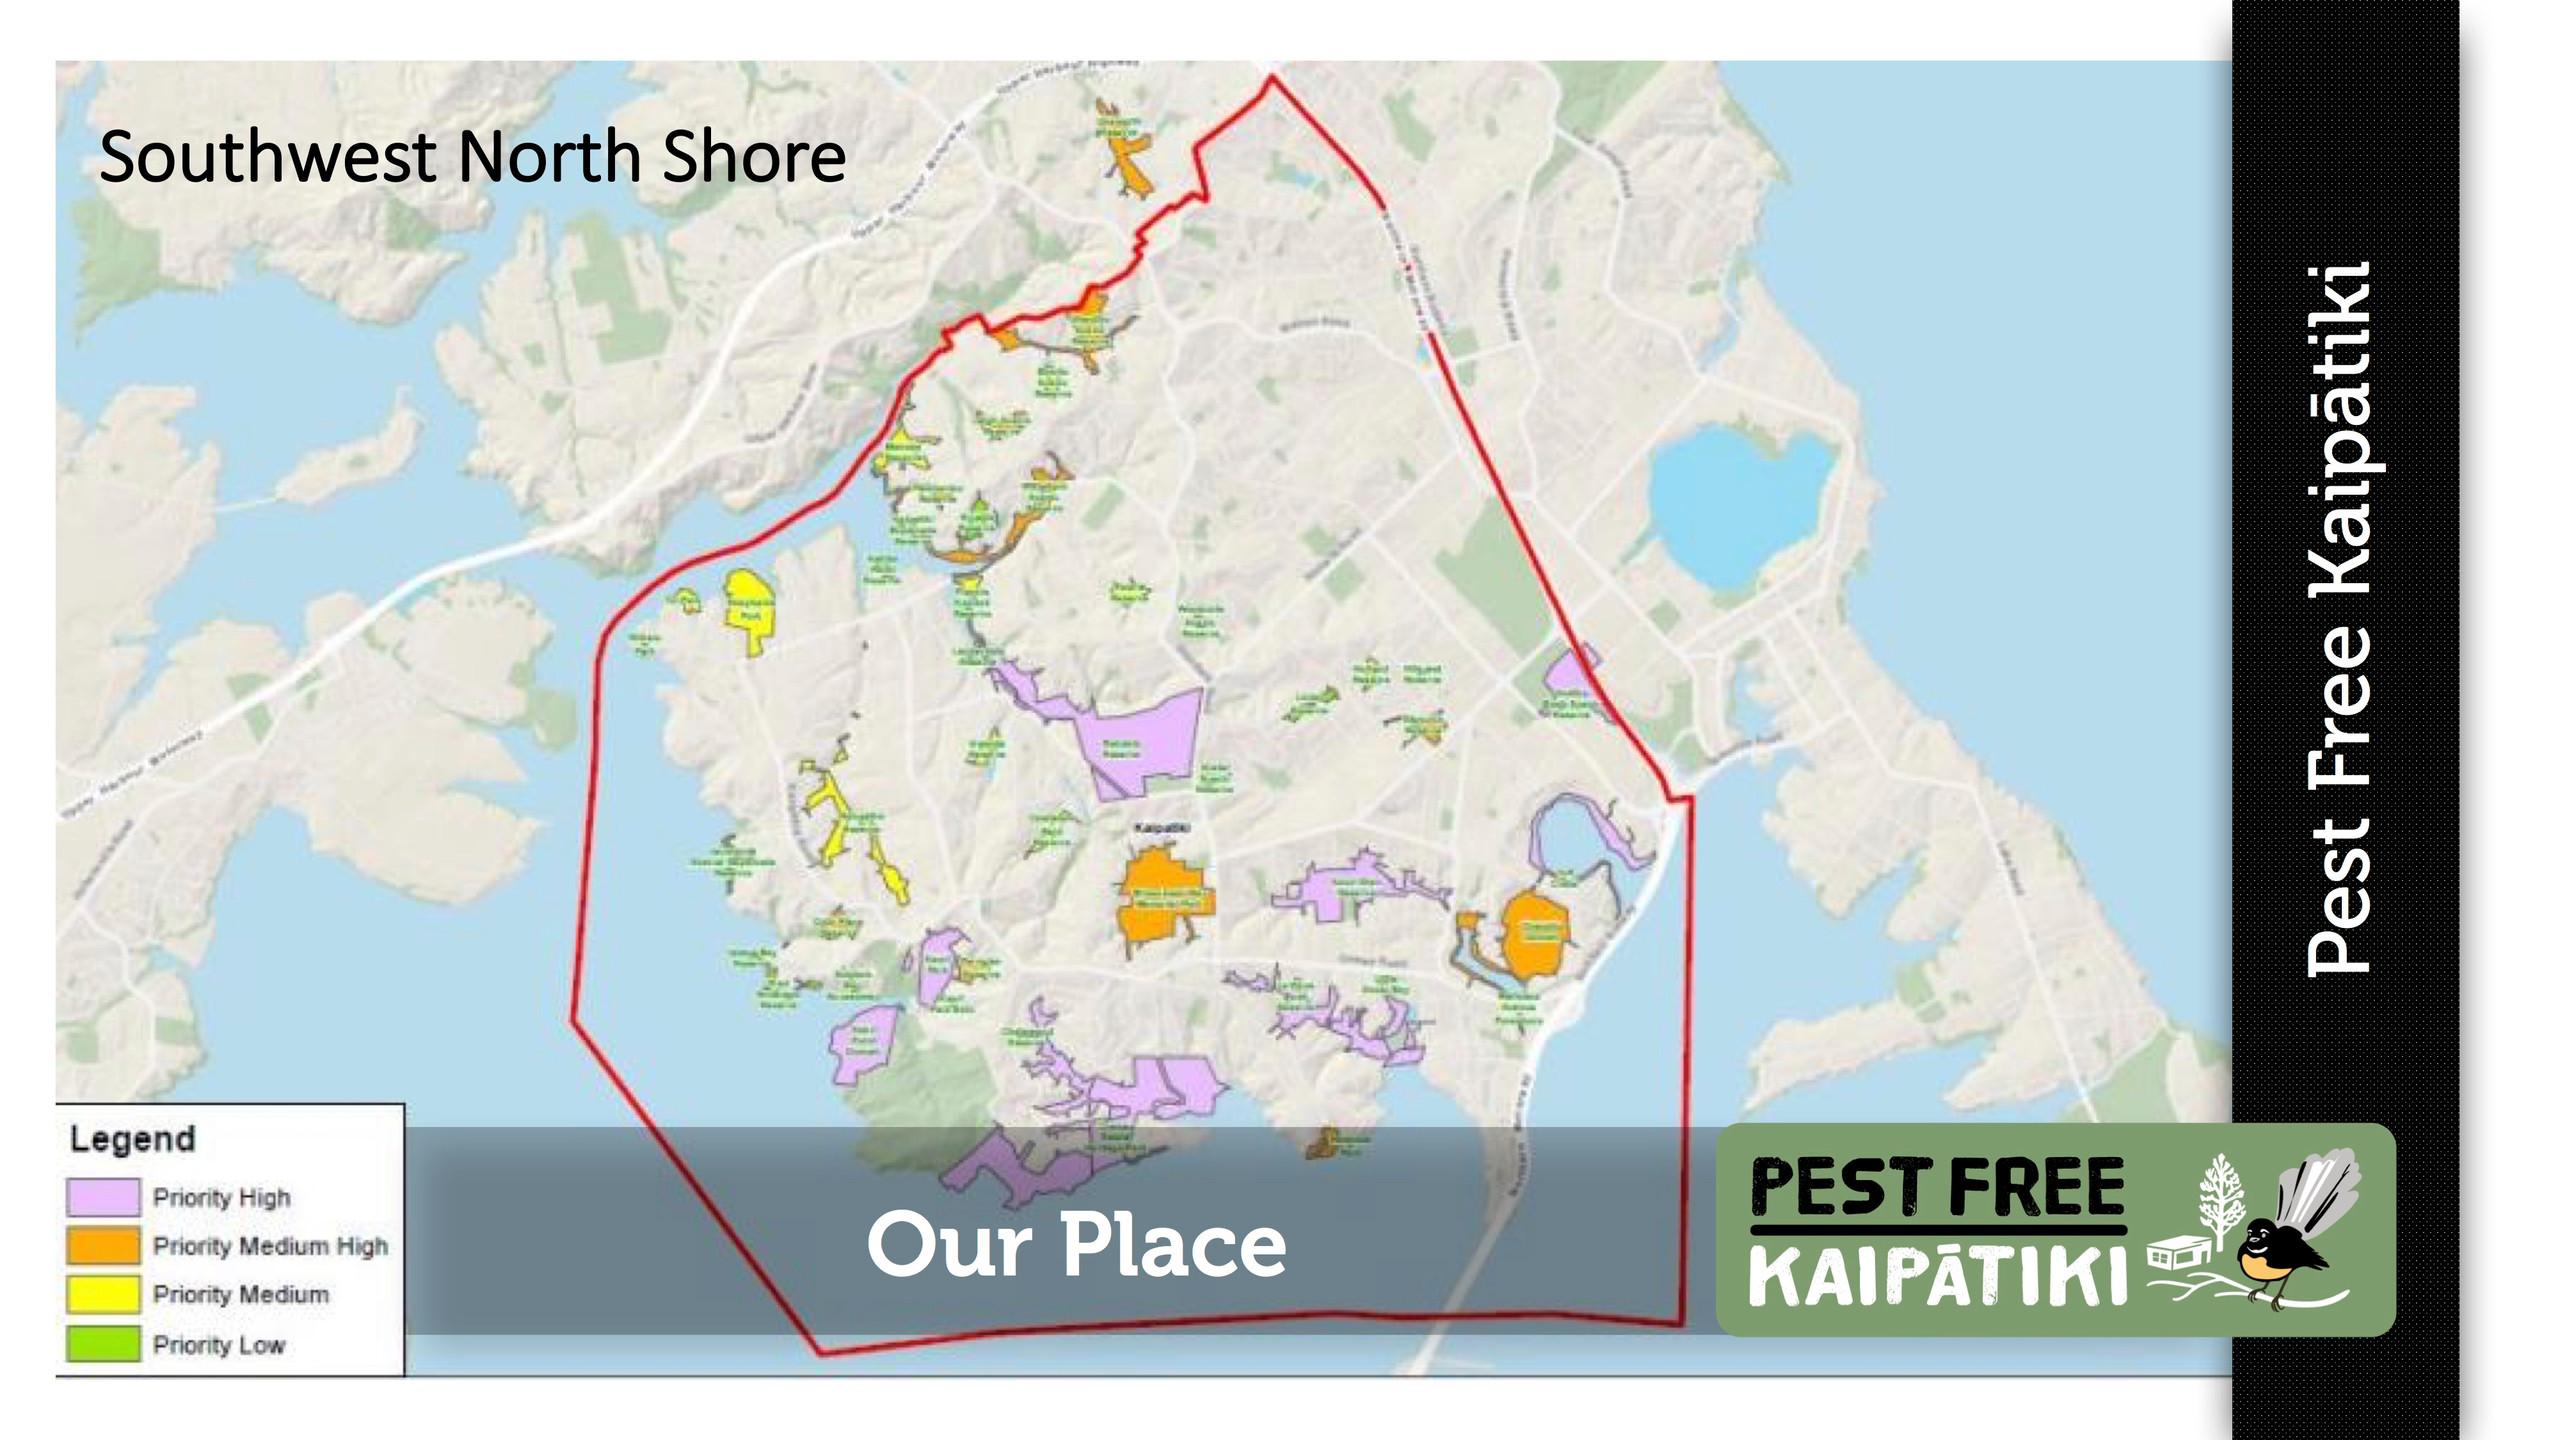 Pest Free Kaipatiki-Pestival-slide6